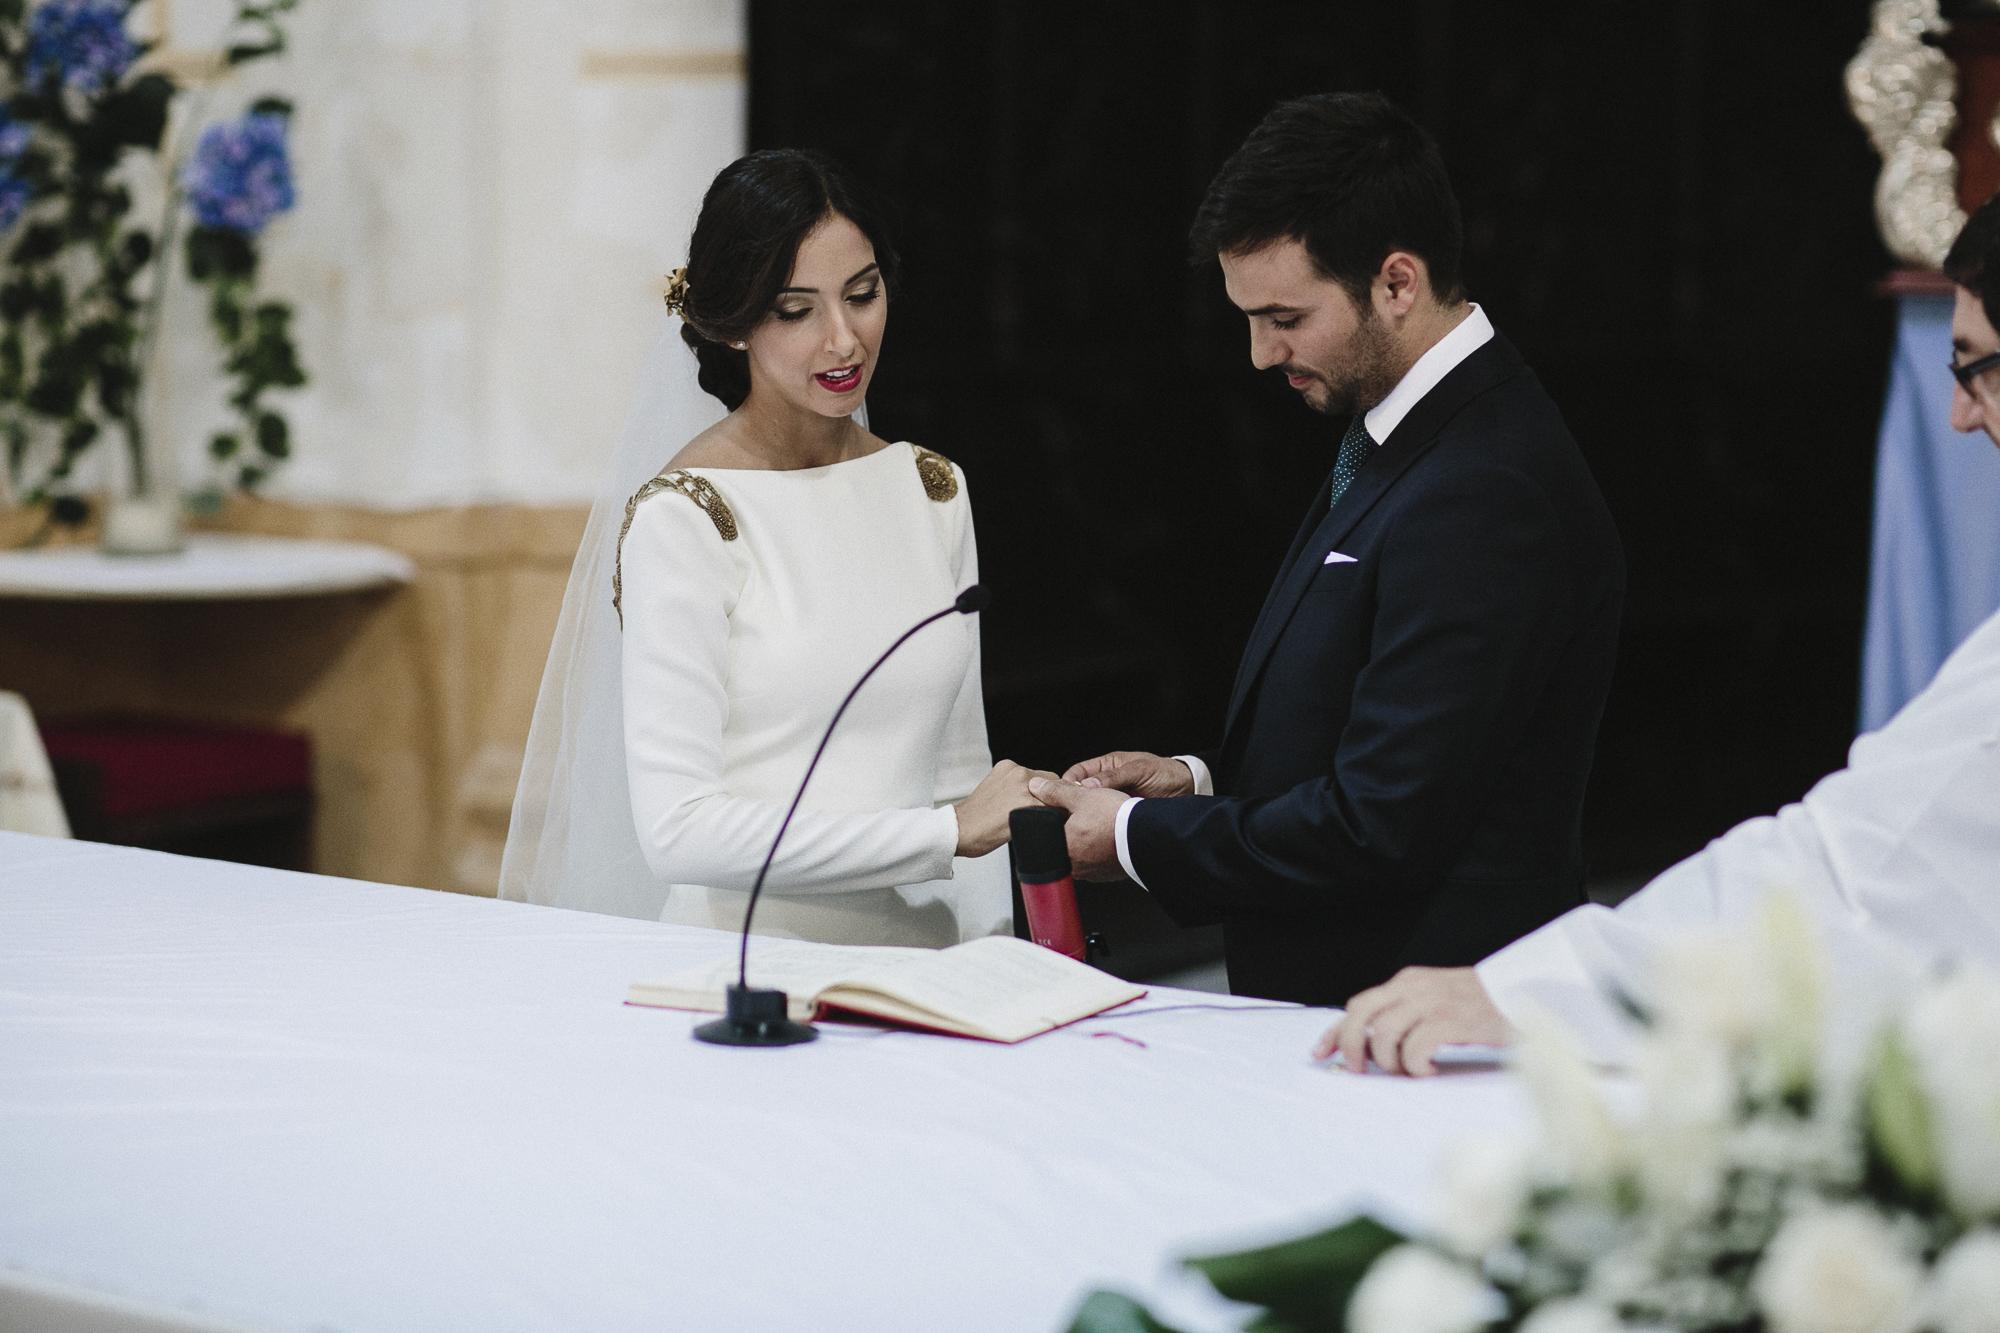 alfonso_flores_destination_wedding_photogrpaher_españa-53.jpg